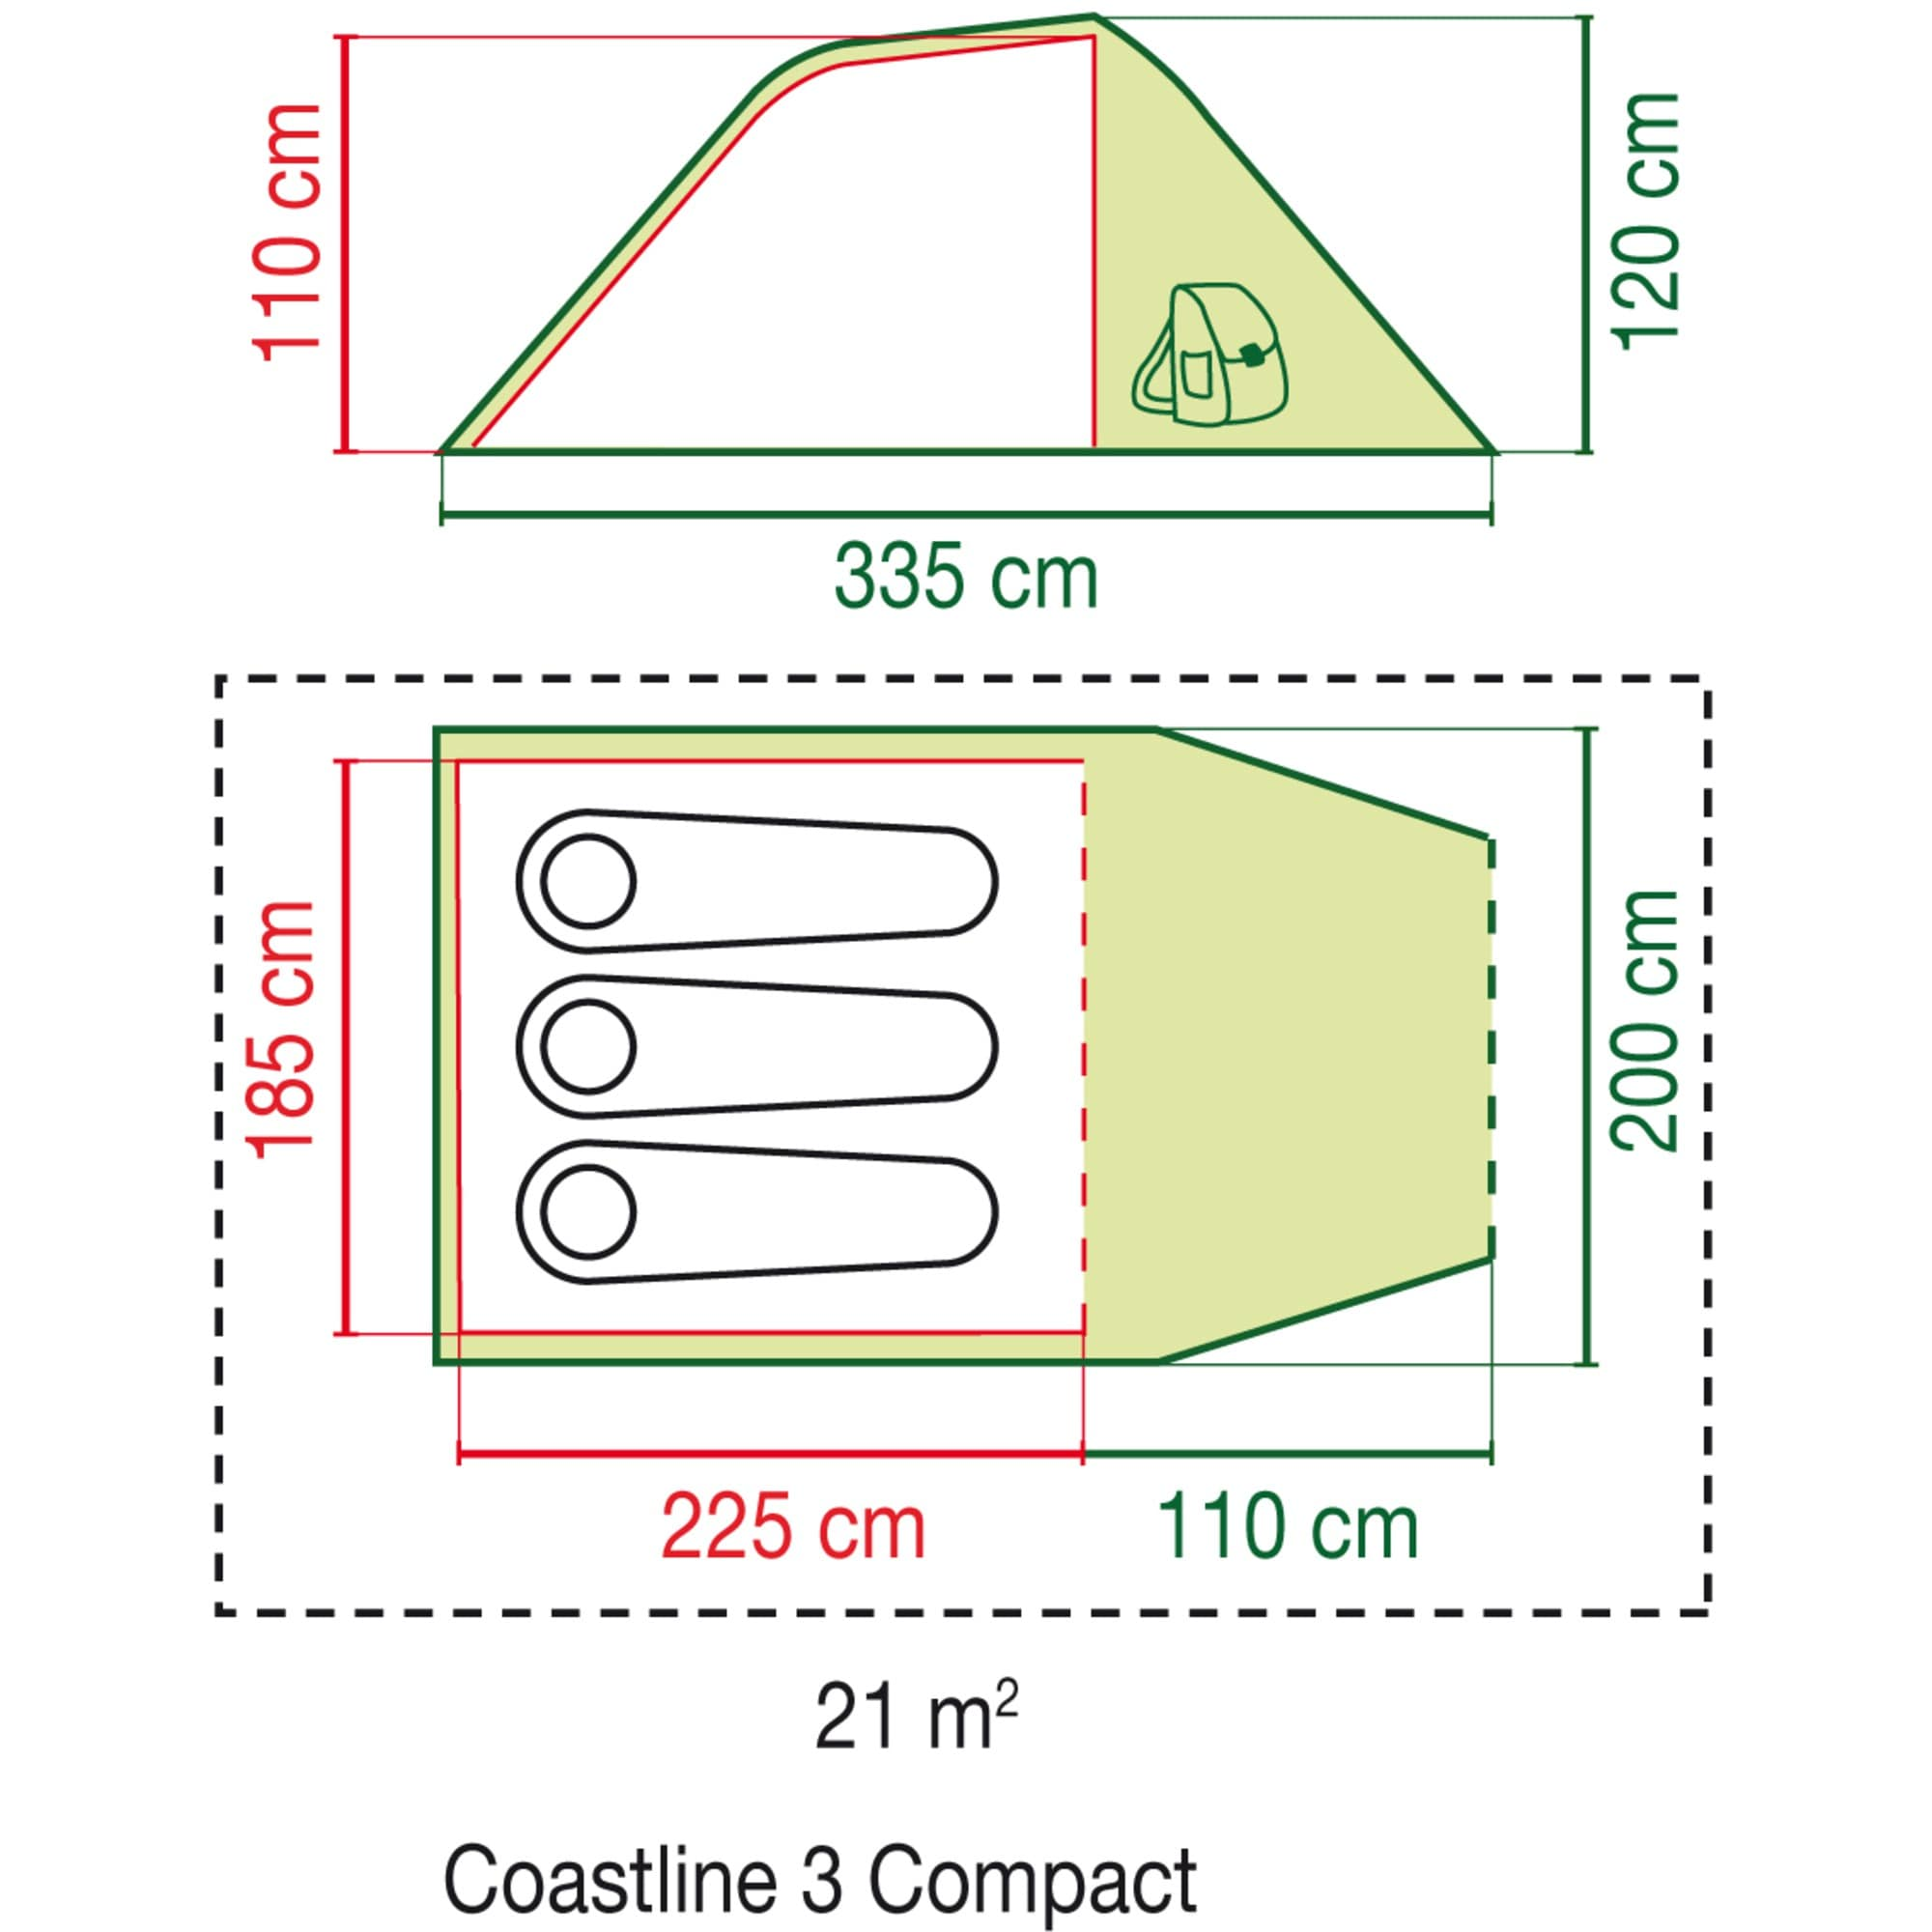 Coleman Zelt 3 Personen Tunnelzelt Coastline 3 Compact